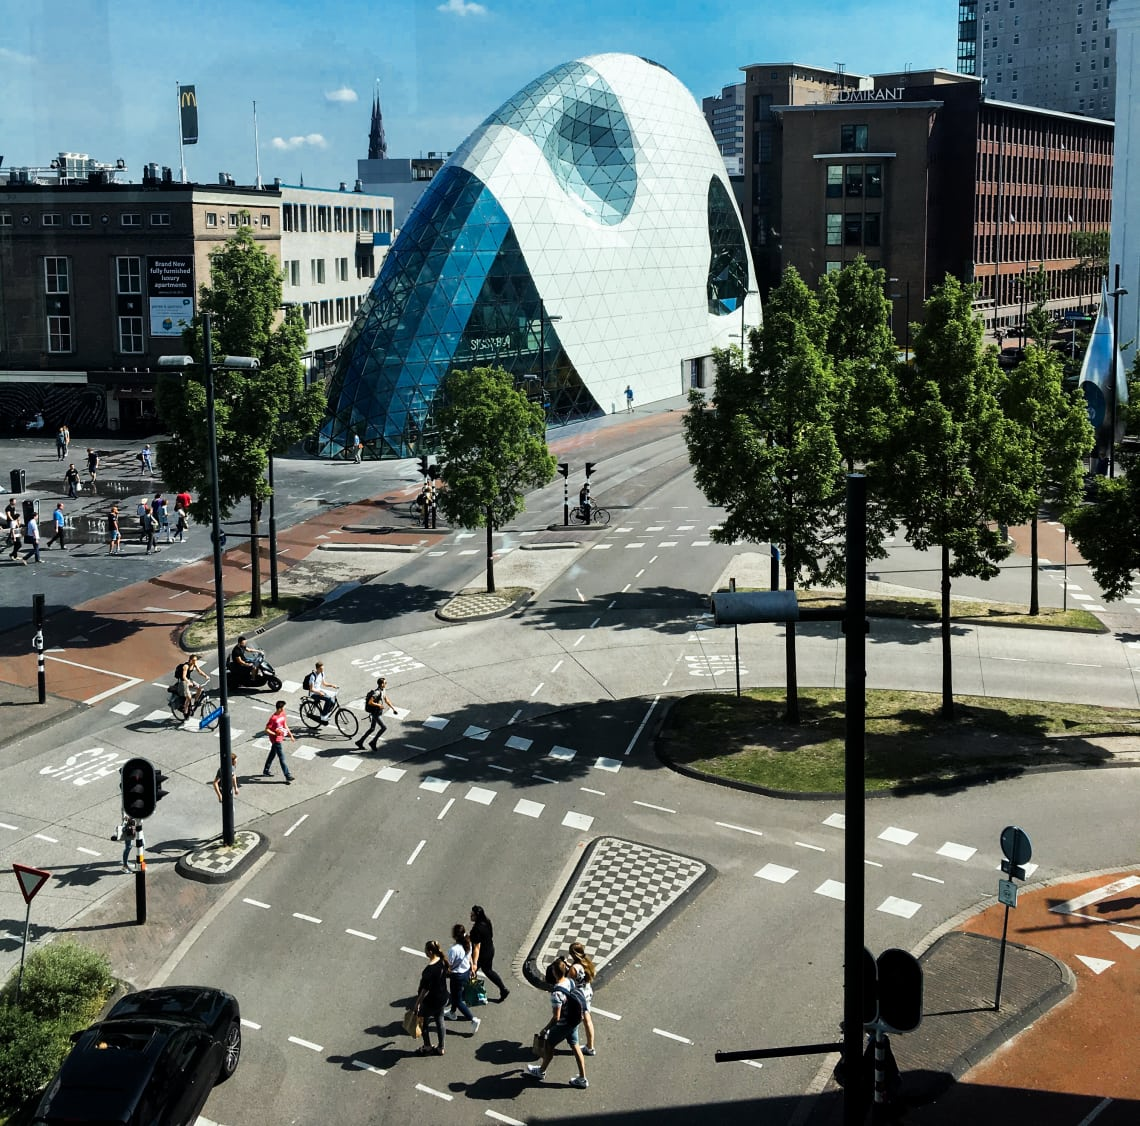 Dicas de passeio em Eindhoven